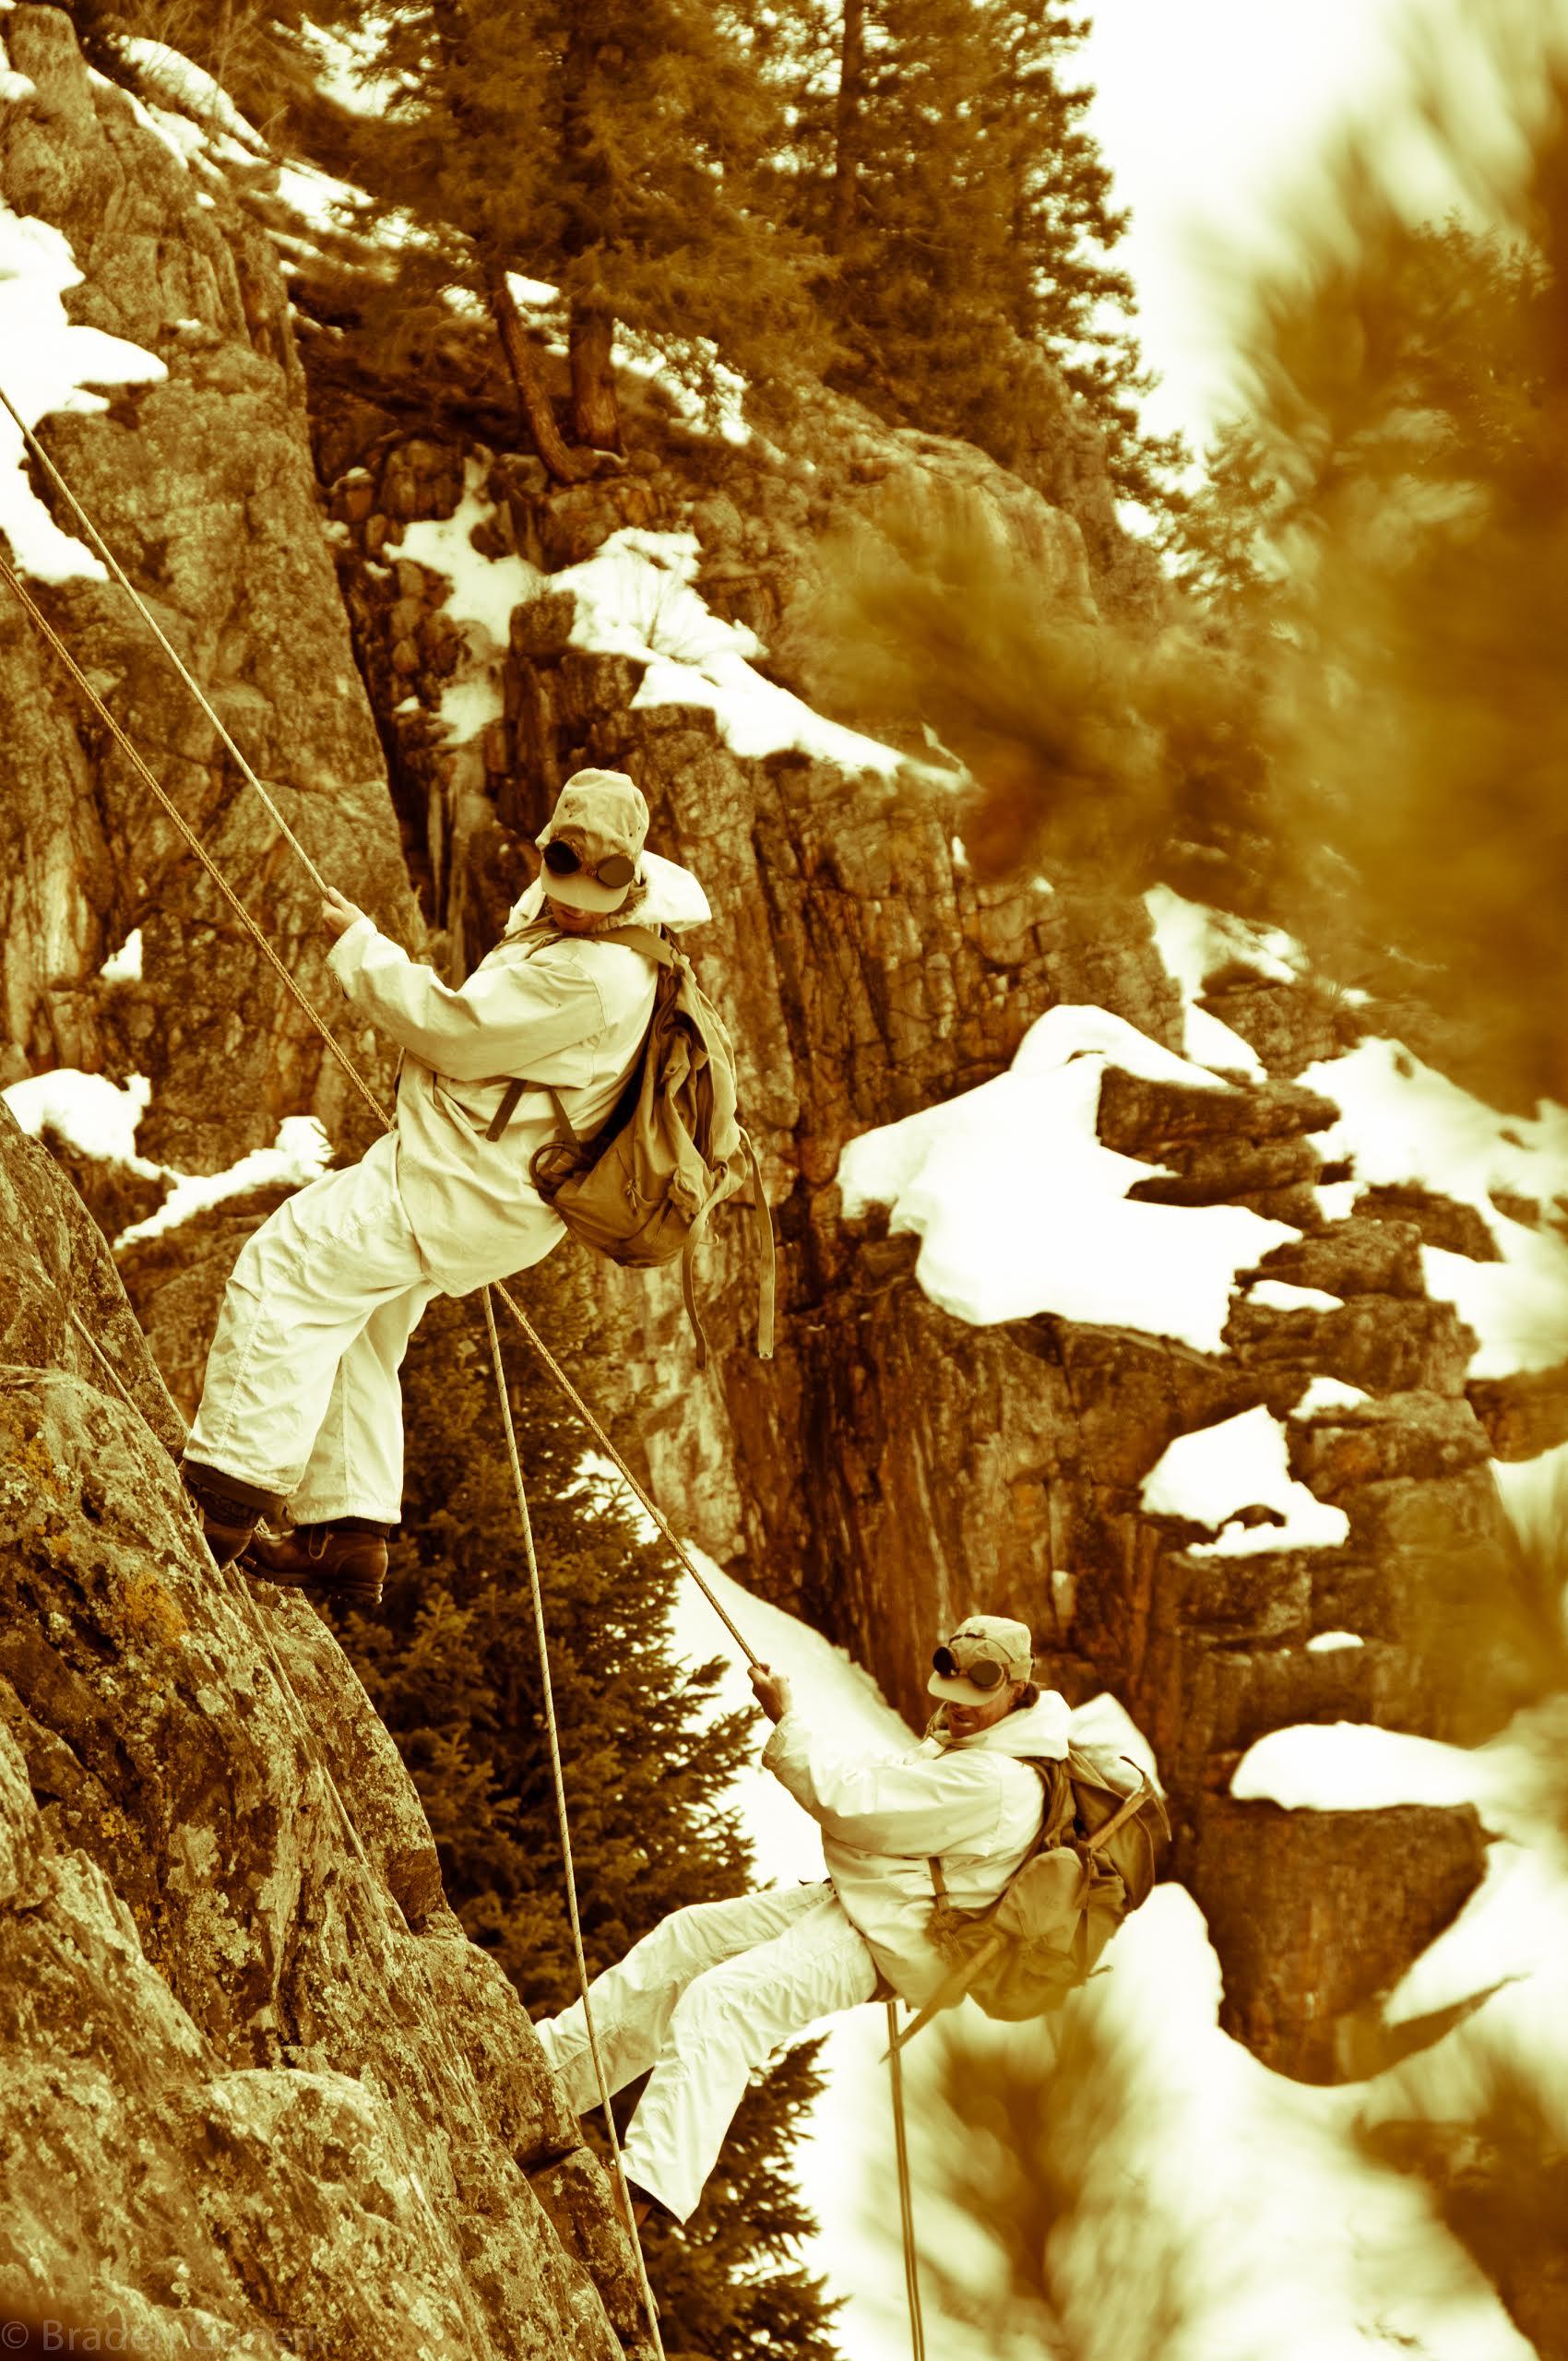 Photo: 'Climb to Glory' hub article